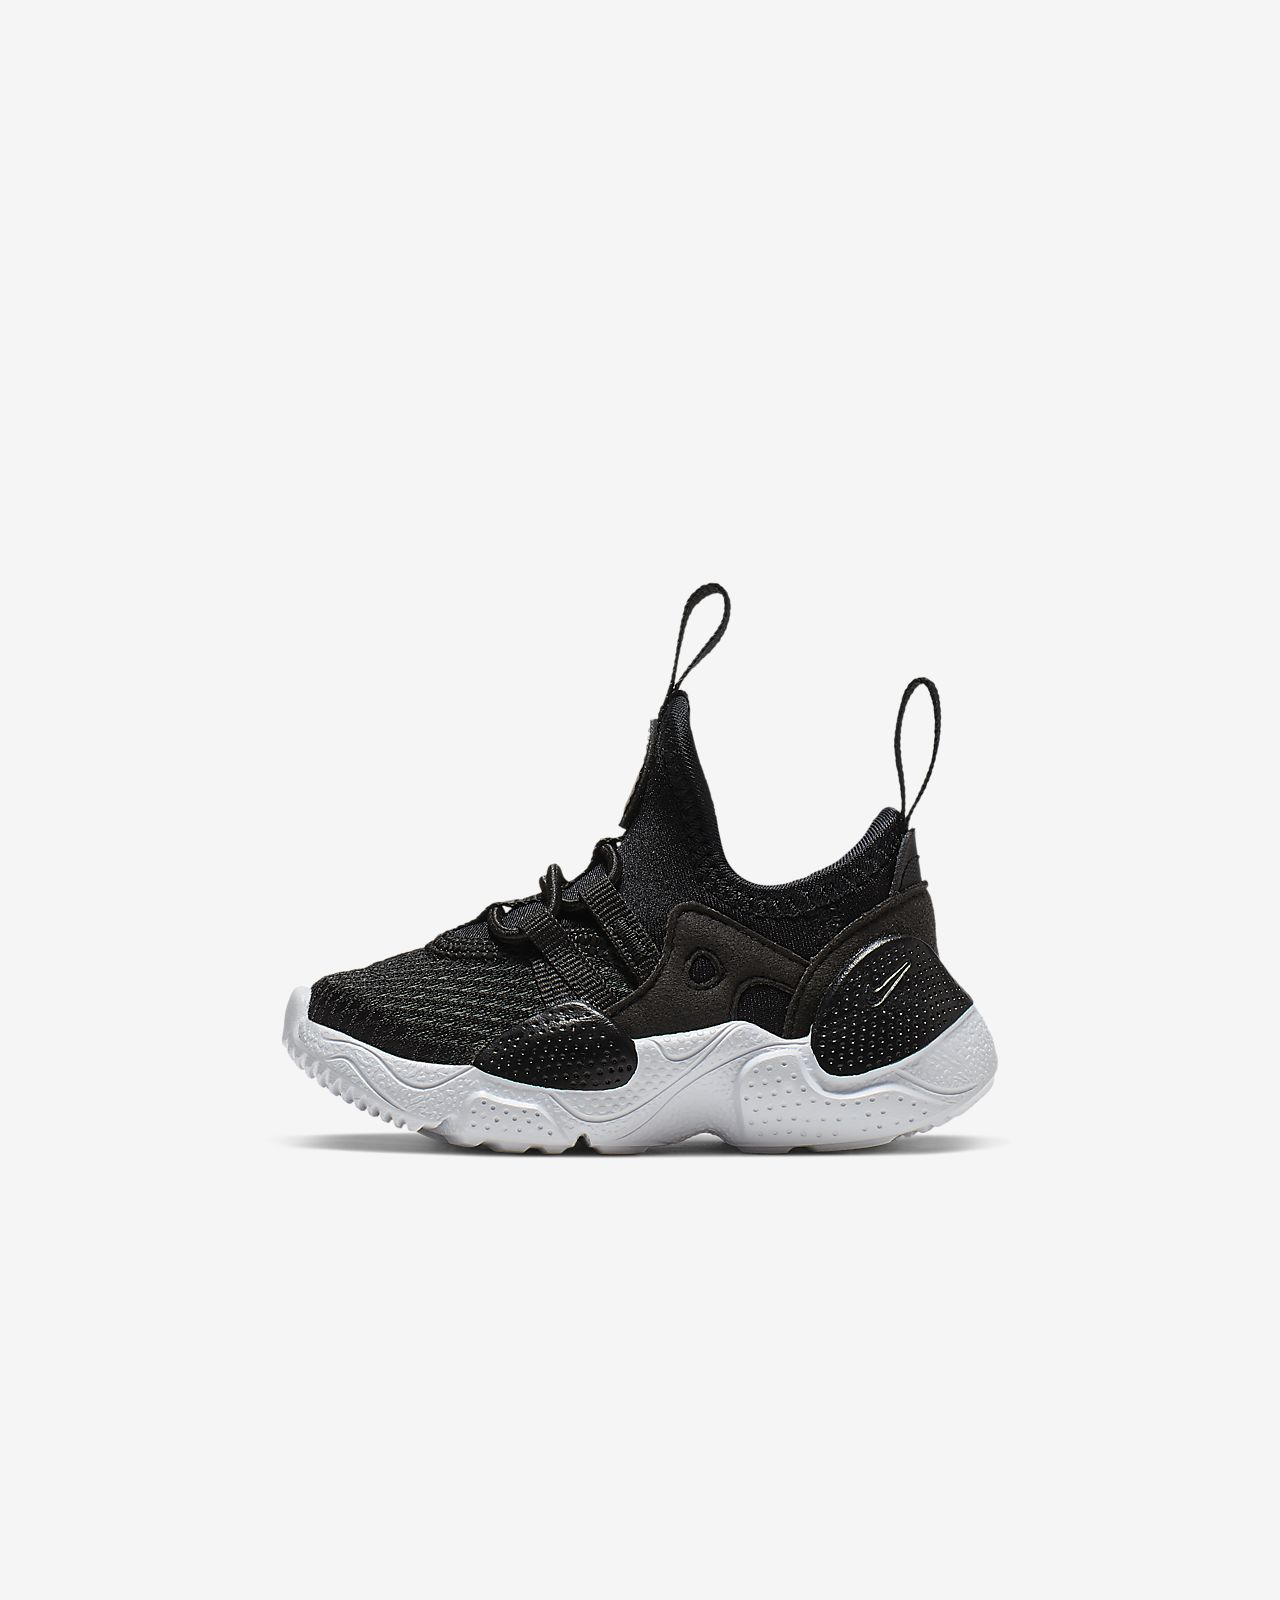 Nike Huarache E.D.G.E. TXT Men's Shoe Philippines Black White Black